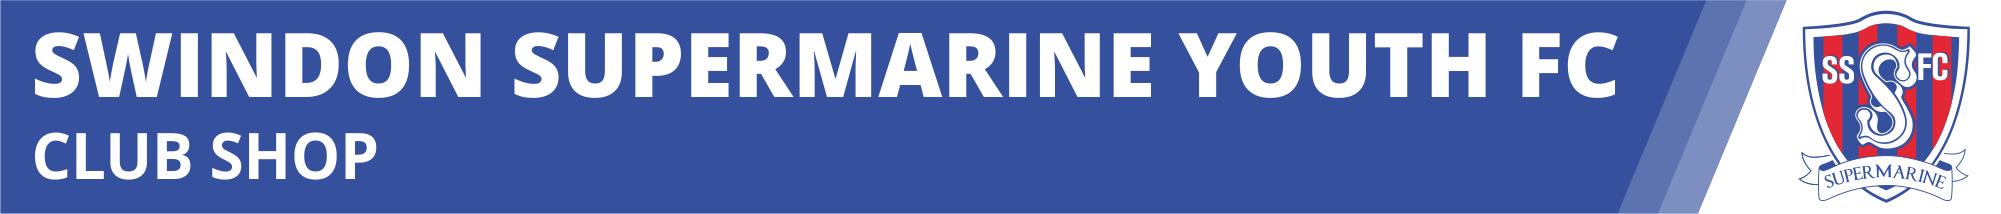 swindon-supermarine-youth-fc-club-shop-banner.png